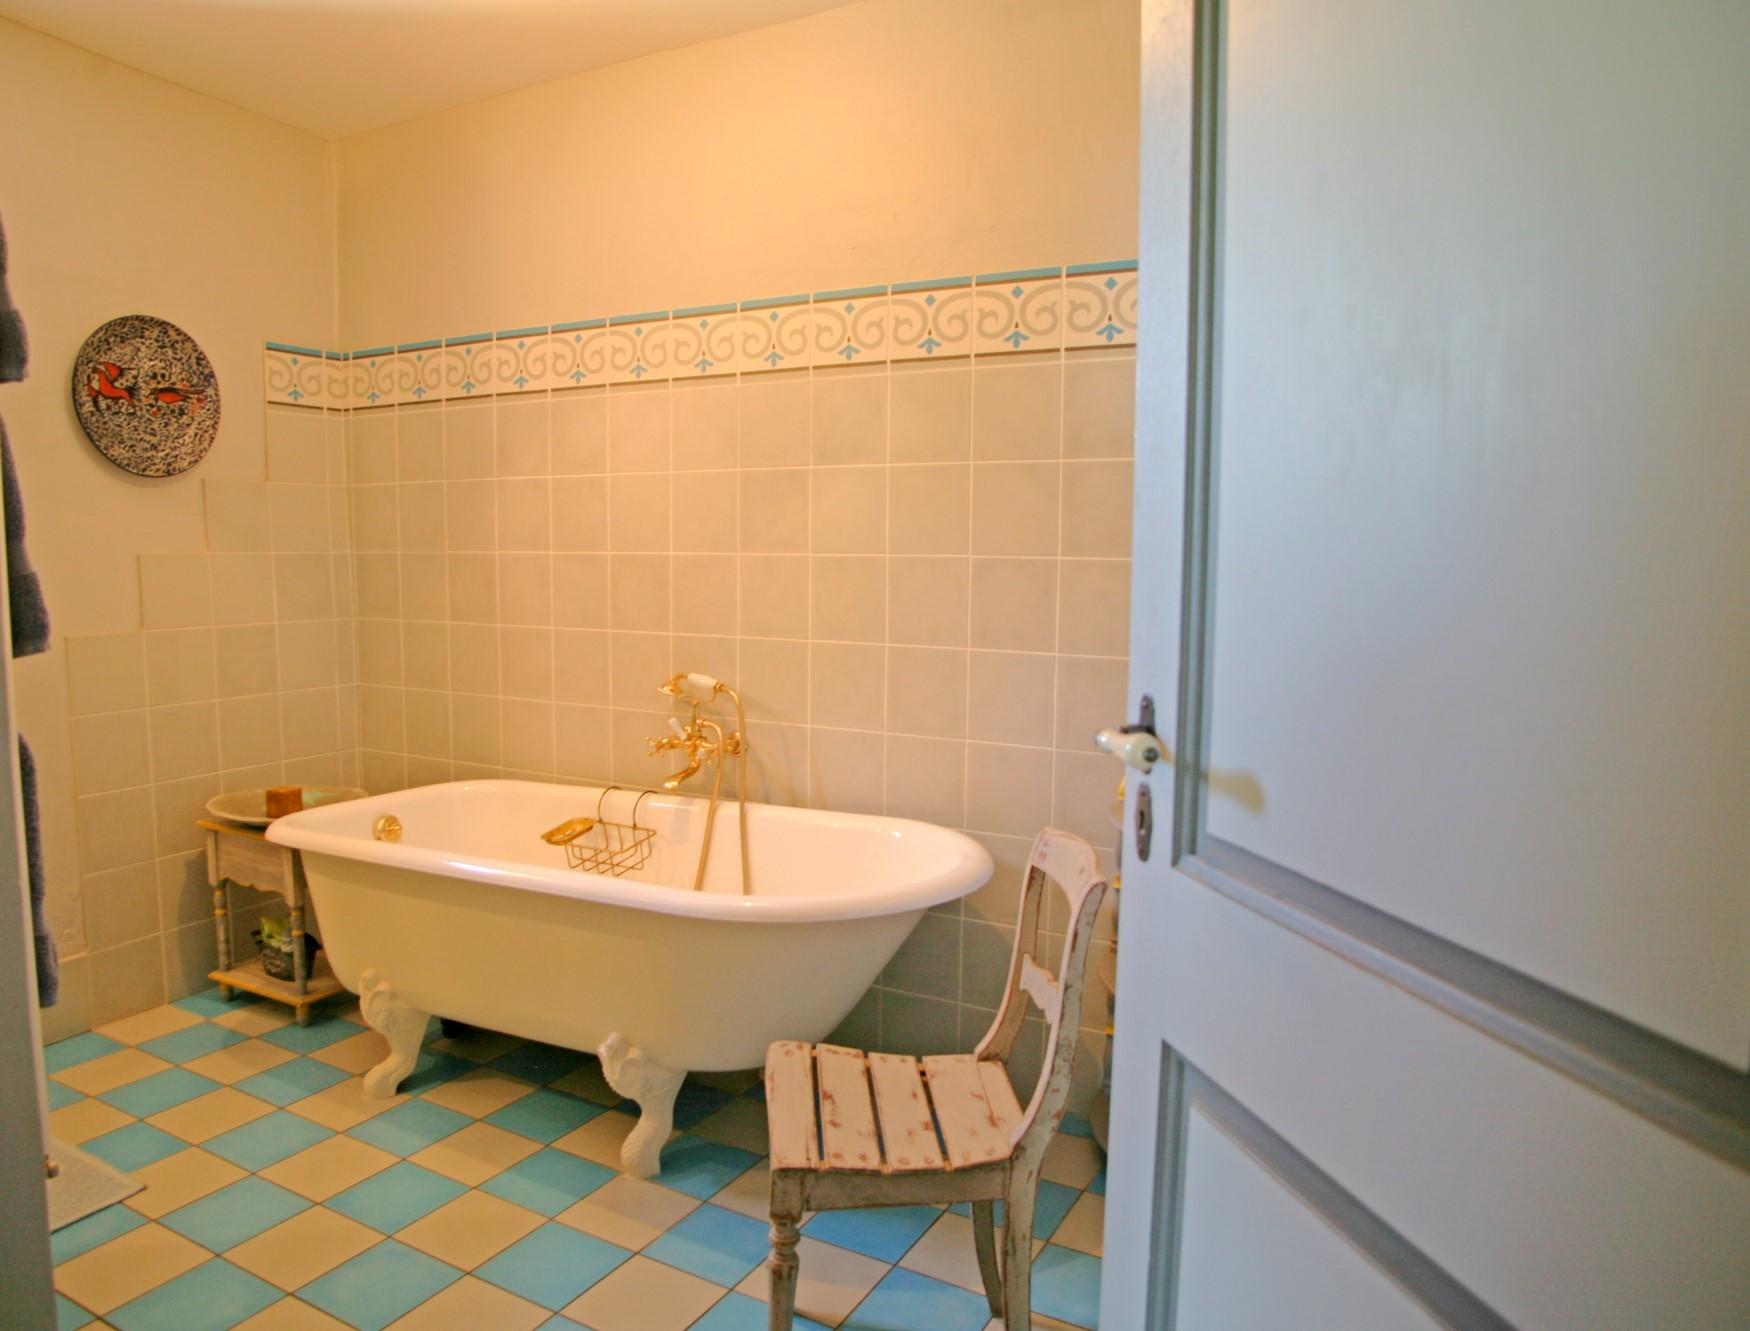 A vendre, Luberon, superbe bastide avec piscine sur presque 7 hectares de terrain